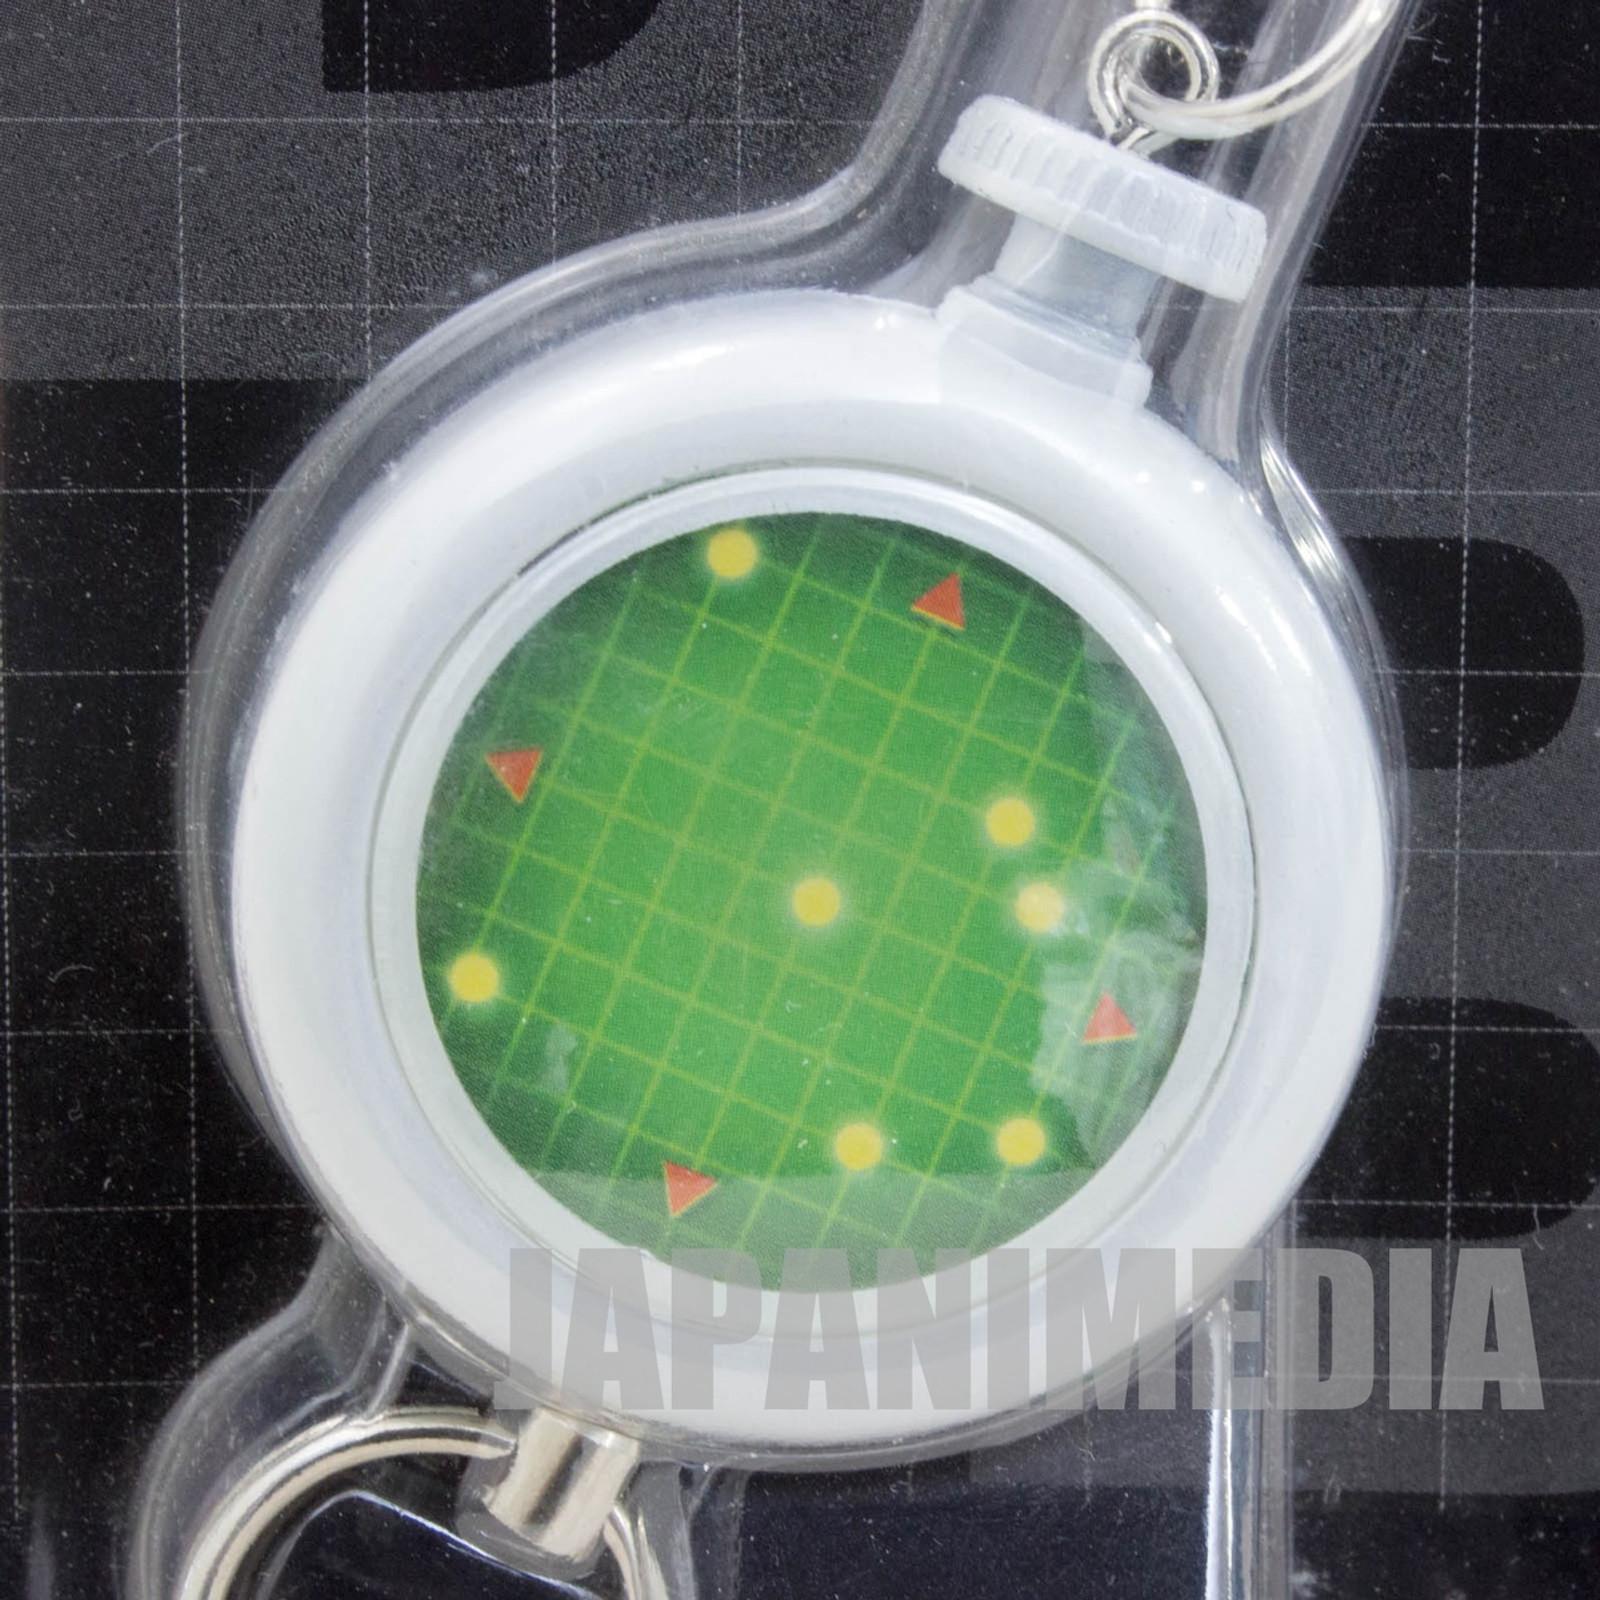 Dragon Ball Z Dragon Radar Reel Keychain Unifive JAPAN ANIME